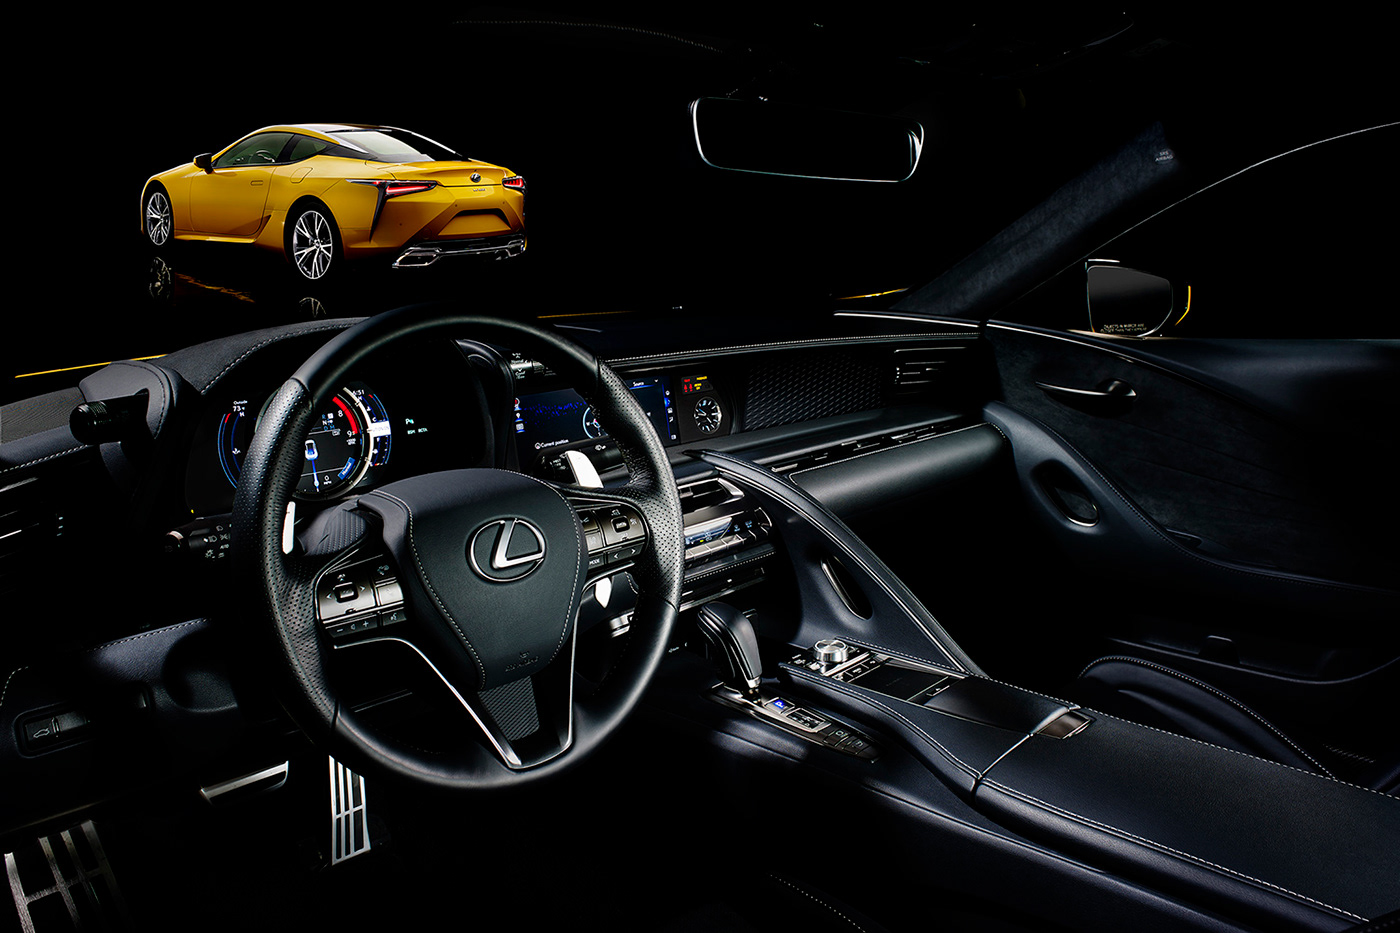 dmitry zhuravlev Photography  automotive   Lexus Lexus LC 500 Esquire